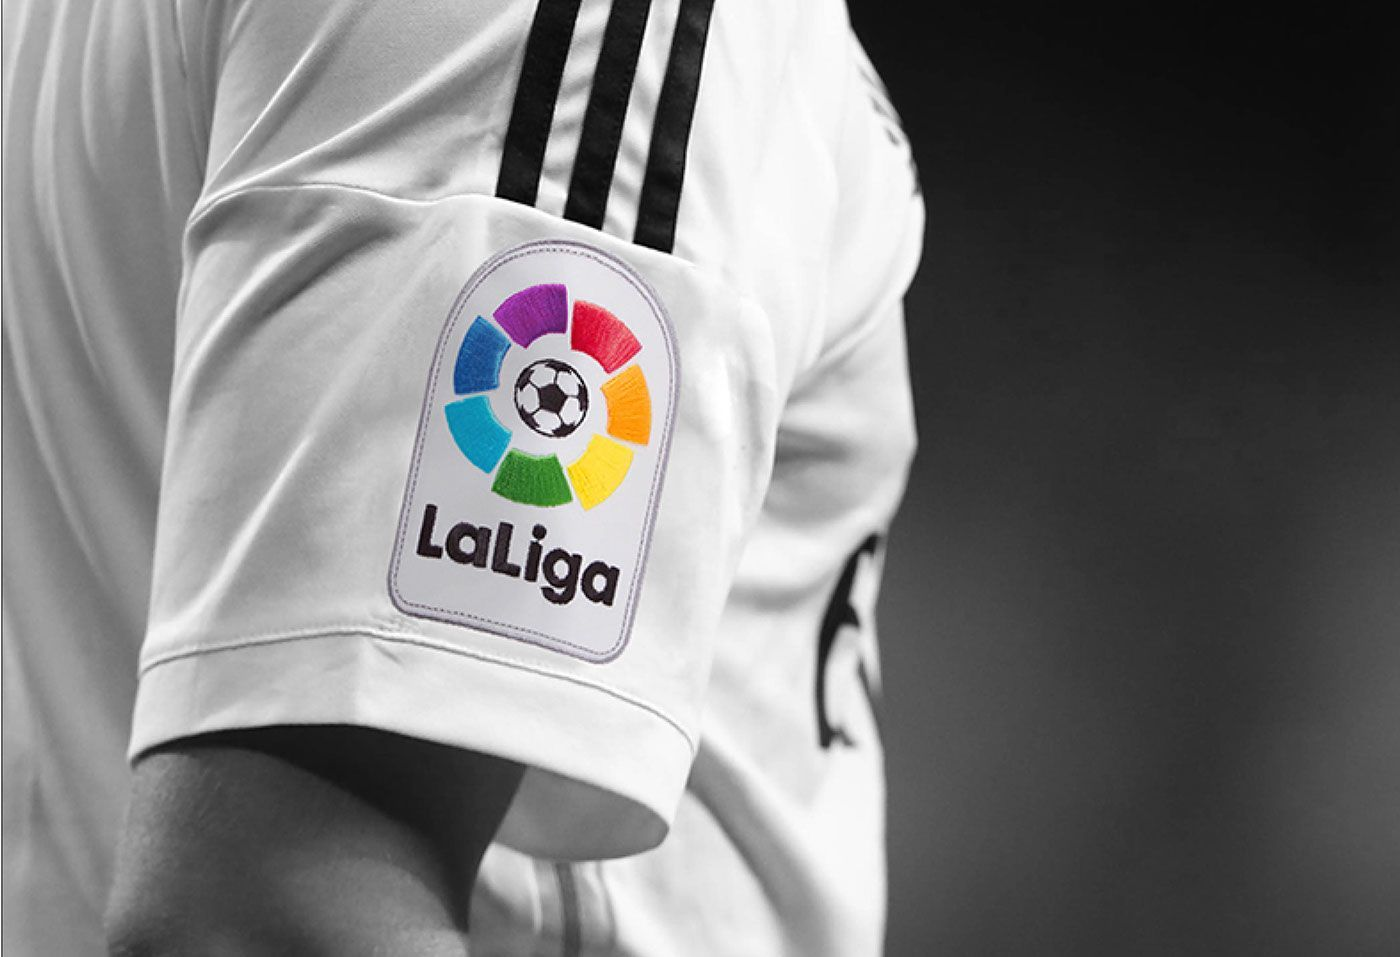 Доход Ла Лиги в сезоне-2020/21 от телерекламы вырастет на 20% — до €110 млн